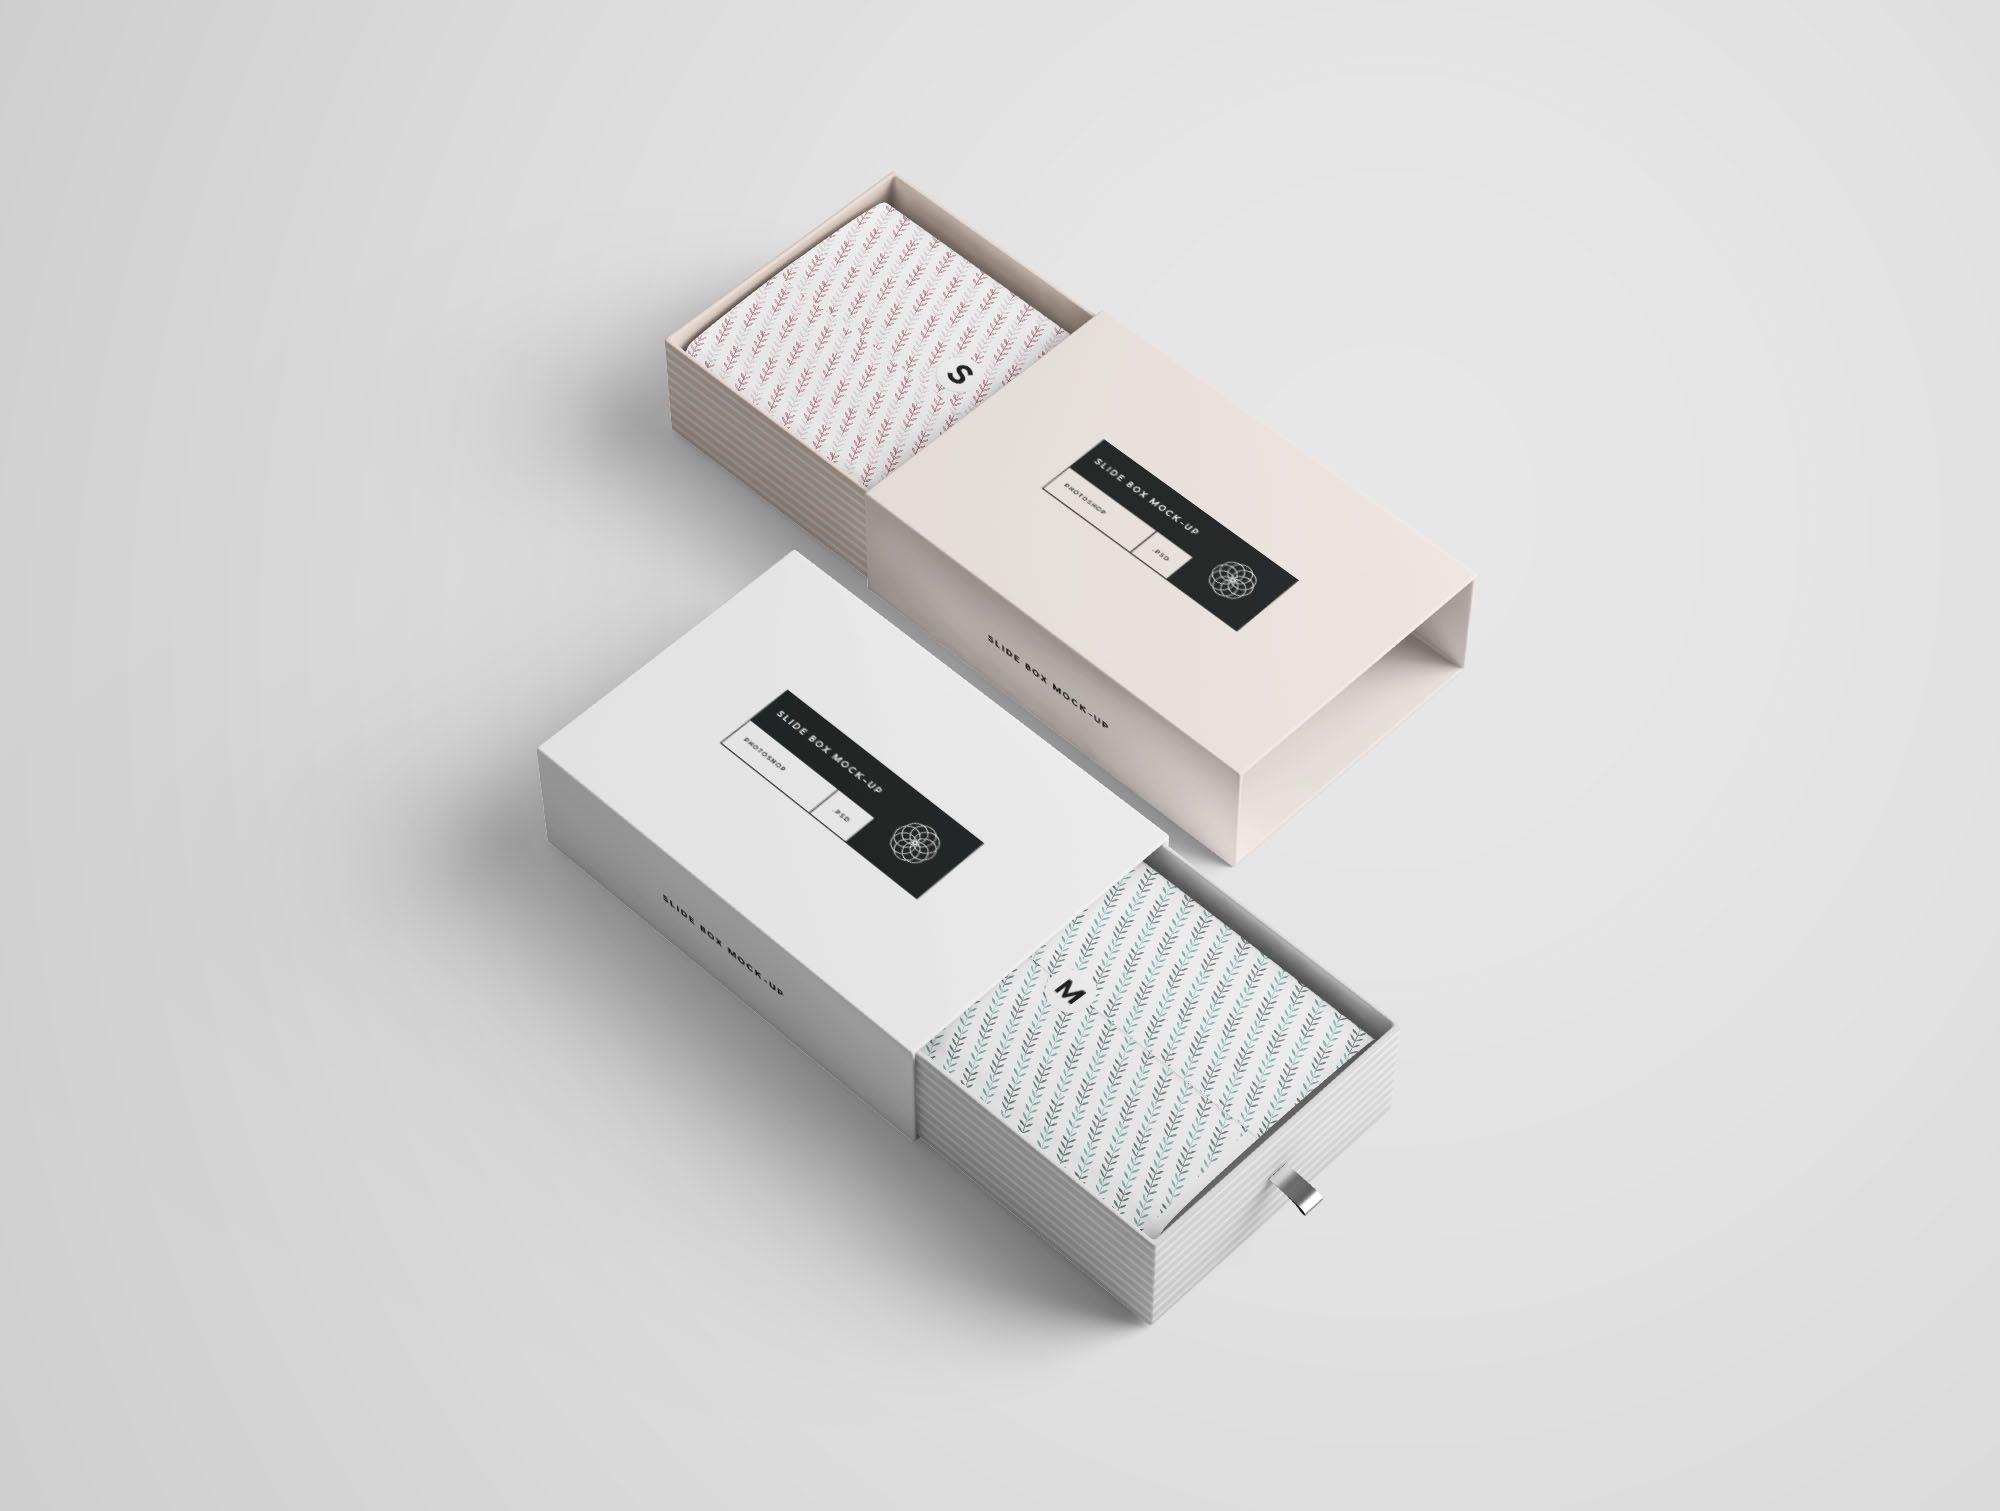 Download 2 Rectangle Slide Box Mockups Box Mockup Slide Box Mockup